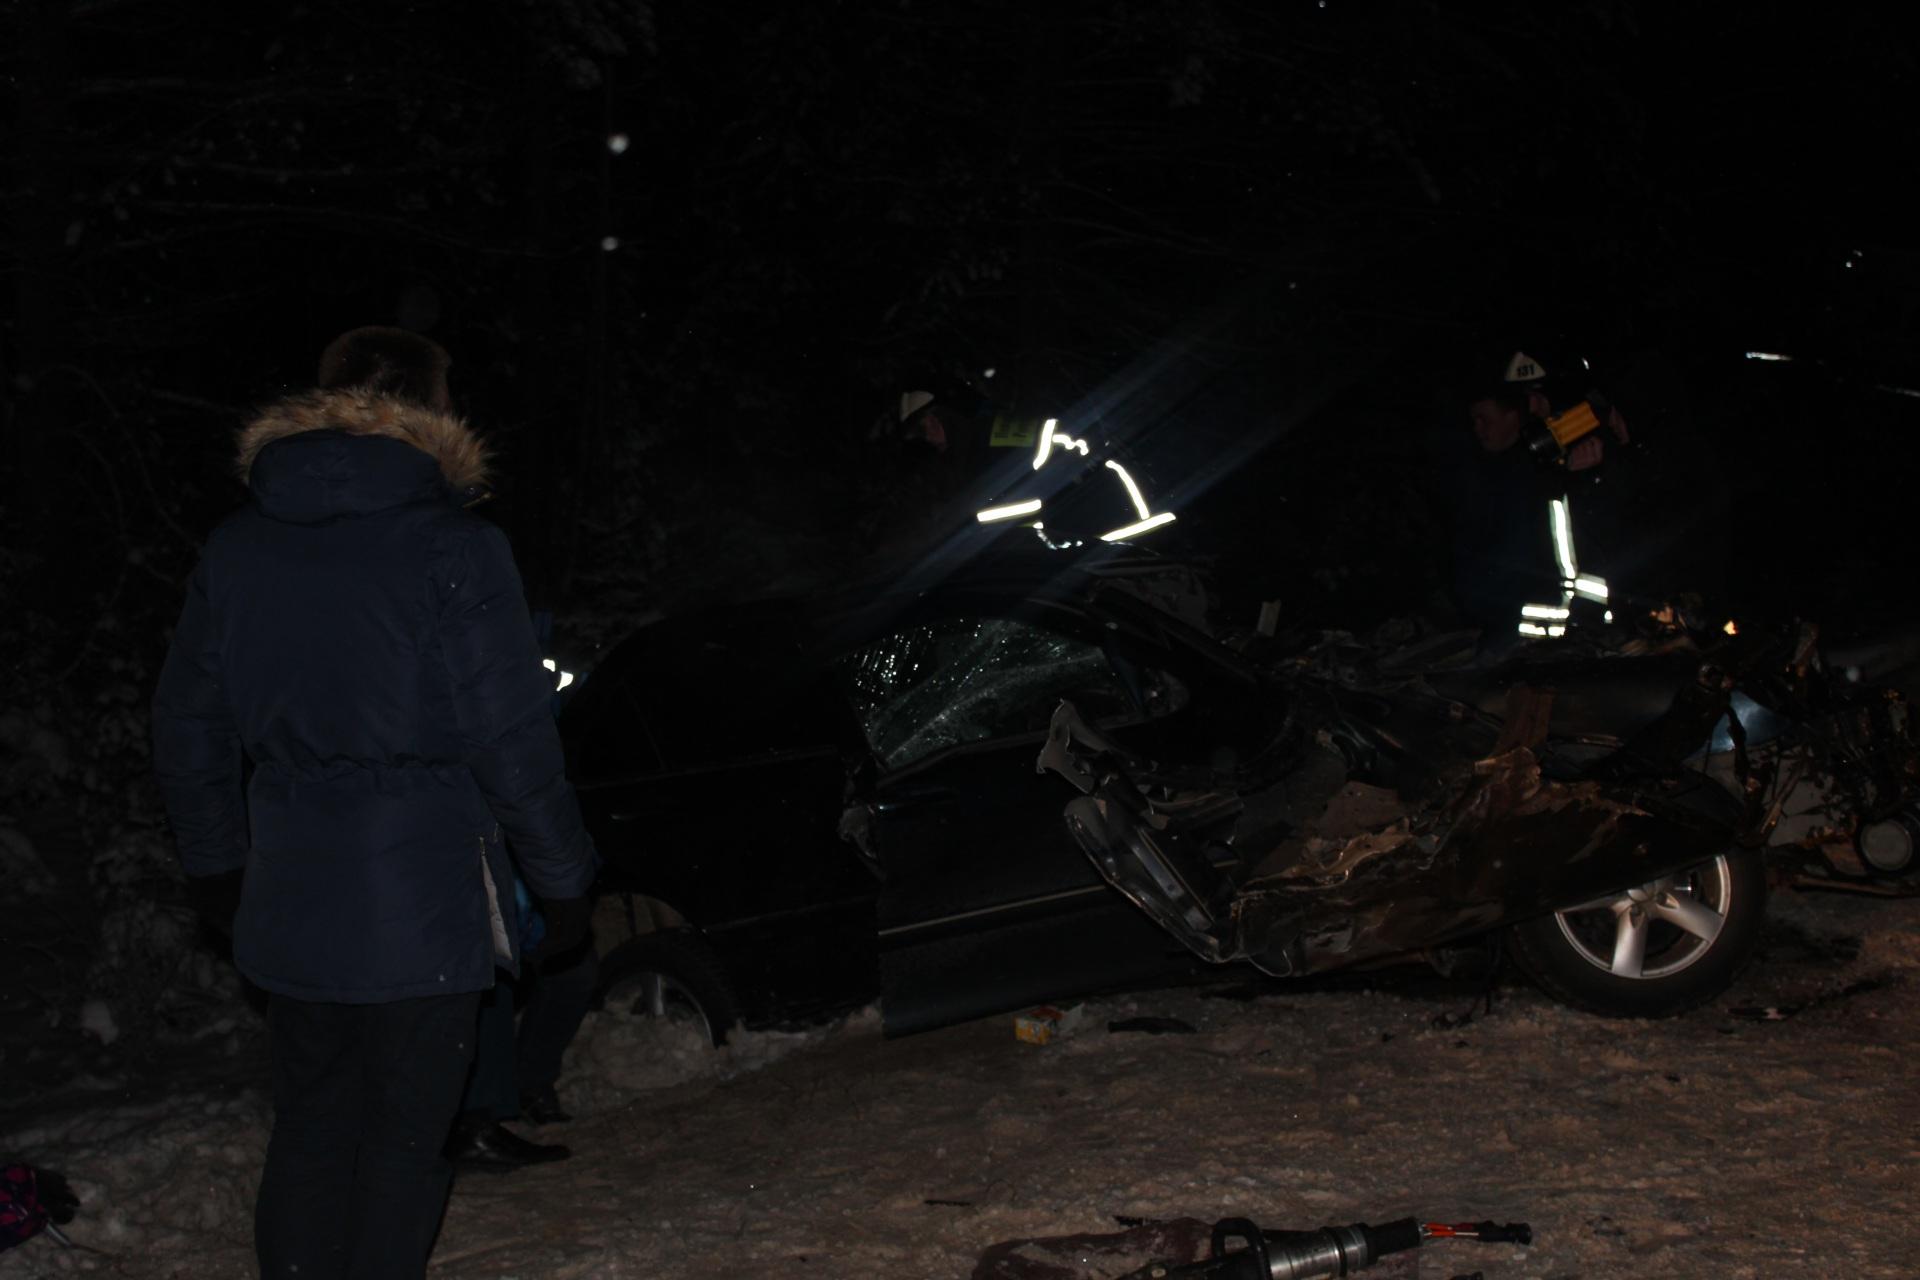 ВКоми лишенный прав шофёр устроил ДТП с 2-мя погибшими